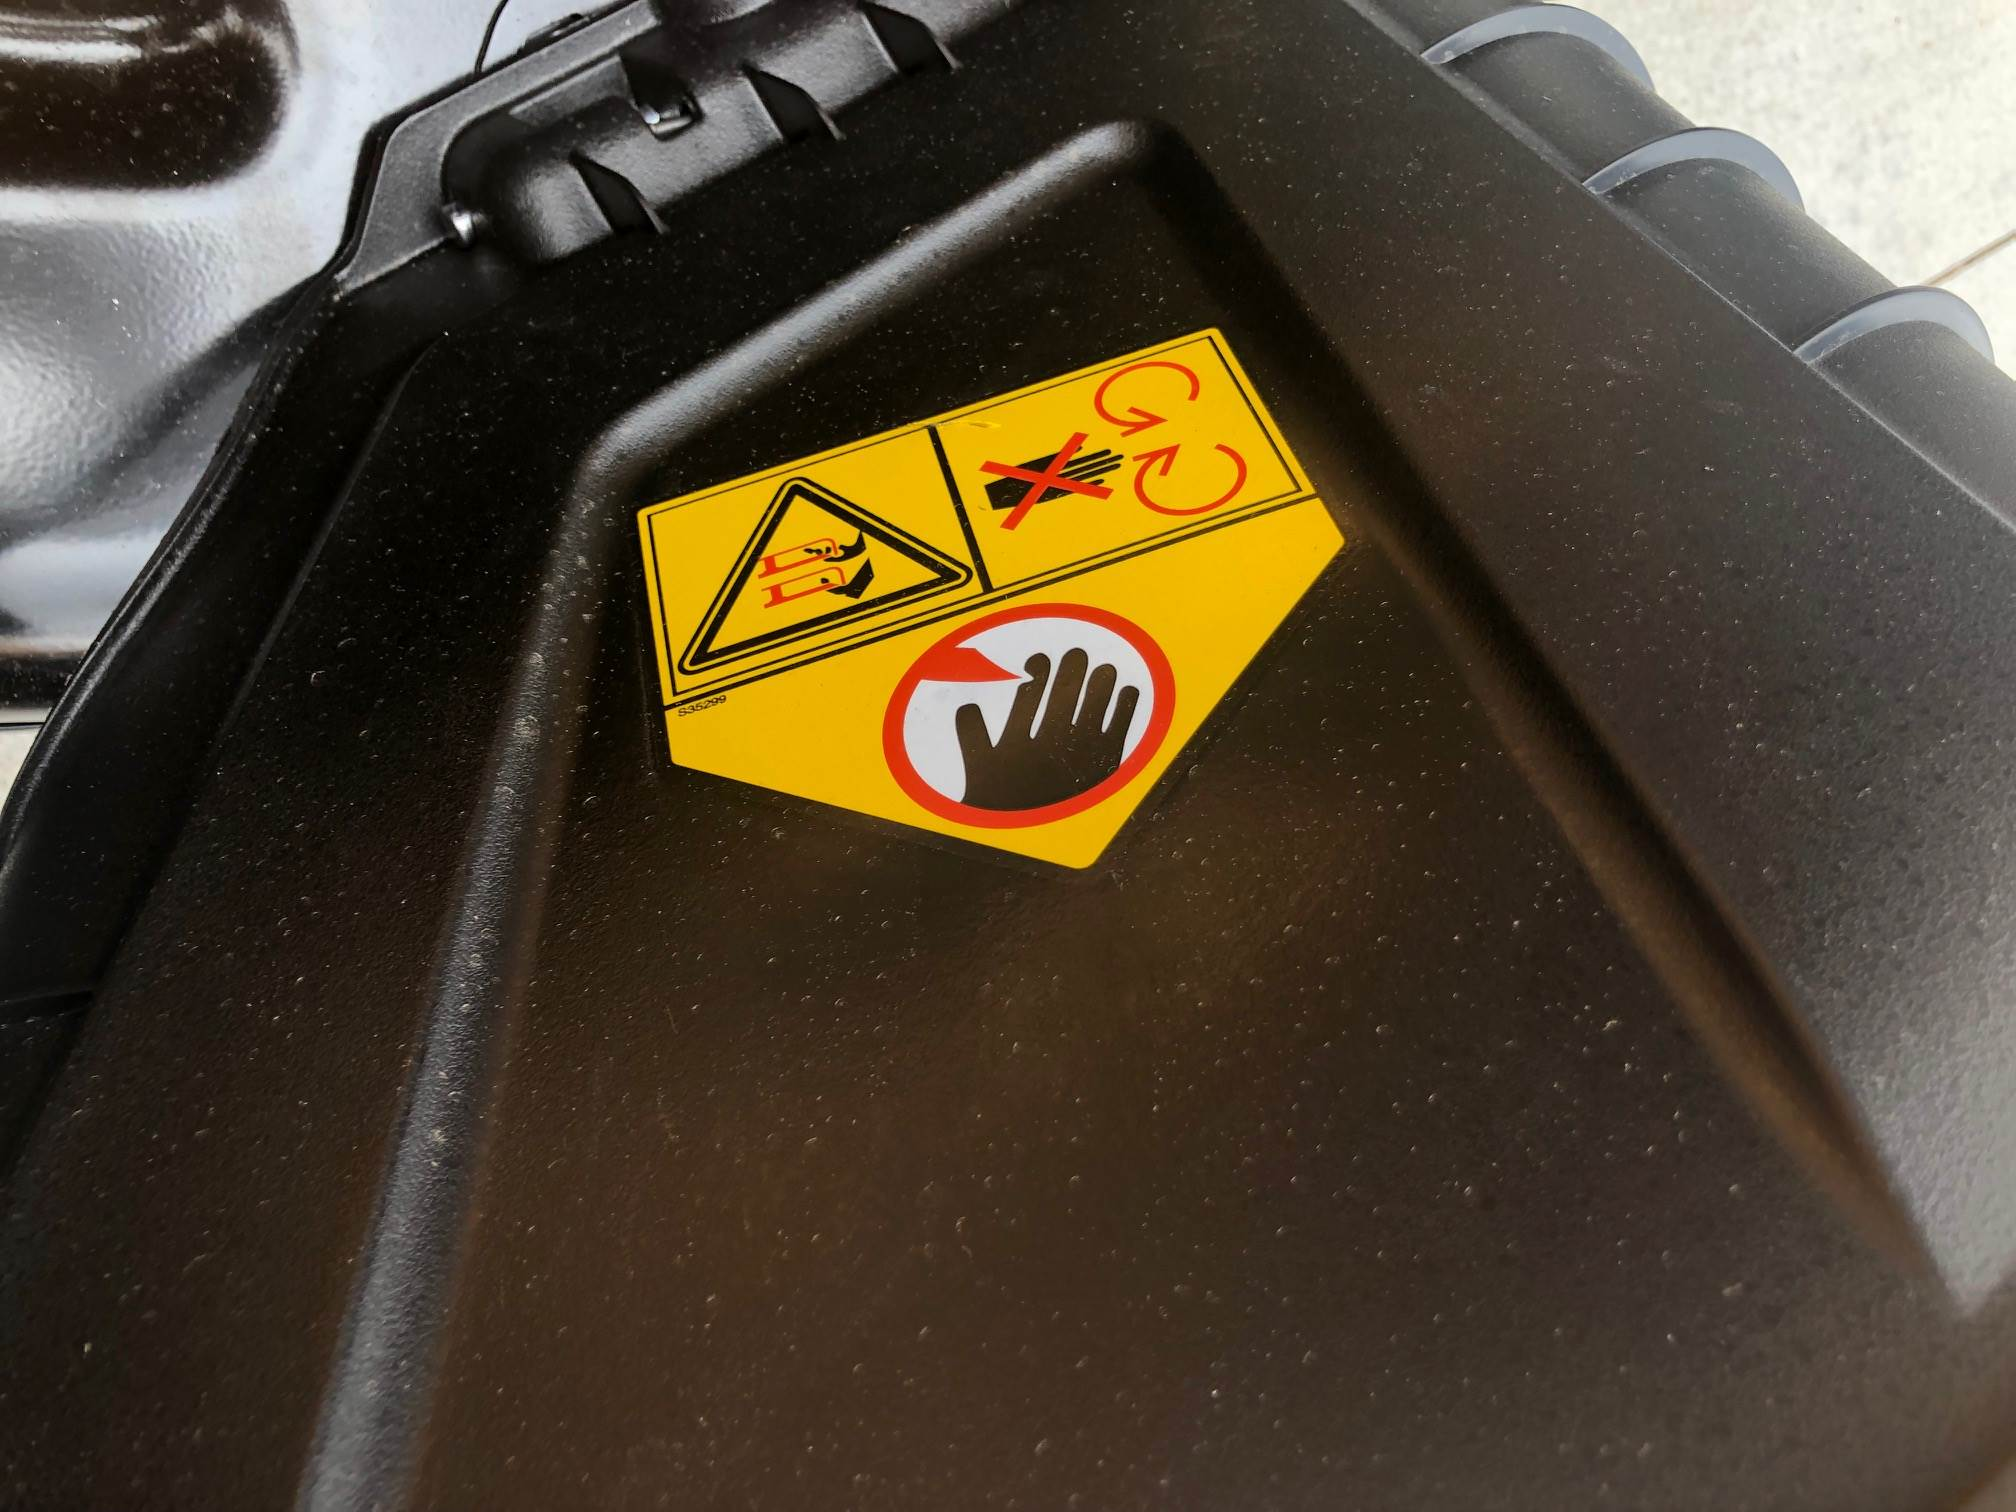 Warning on mower shroud